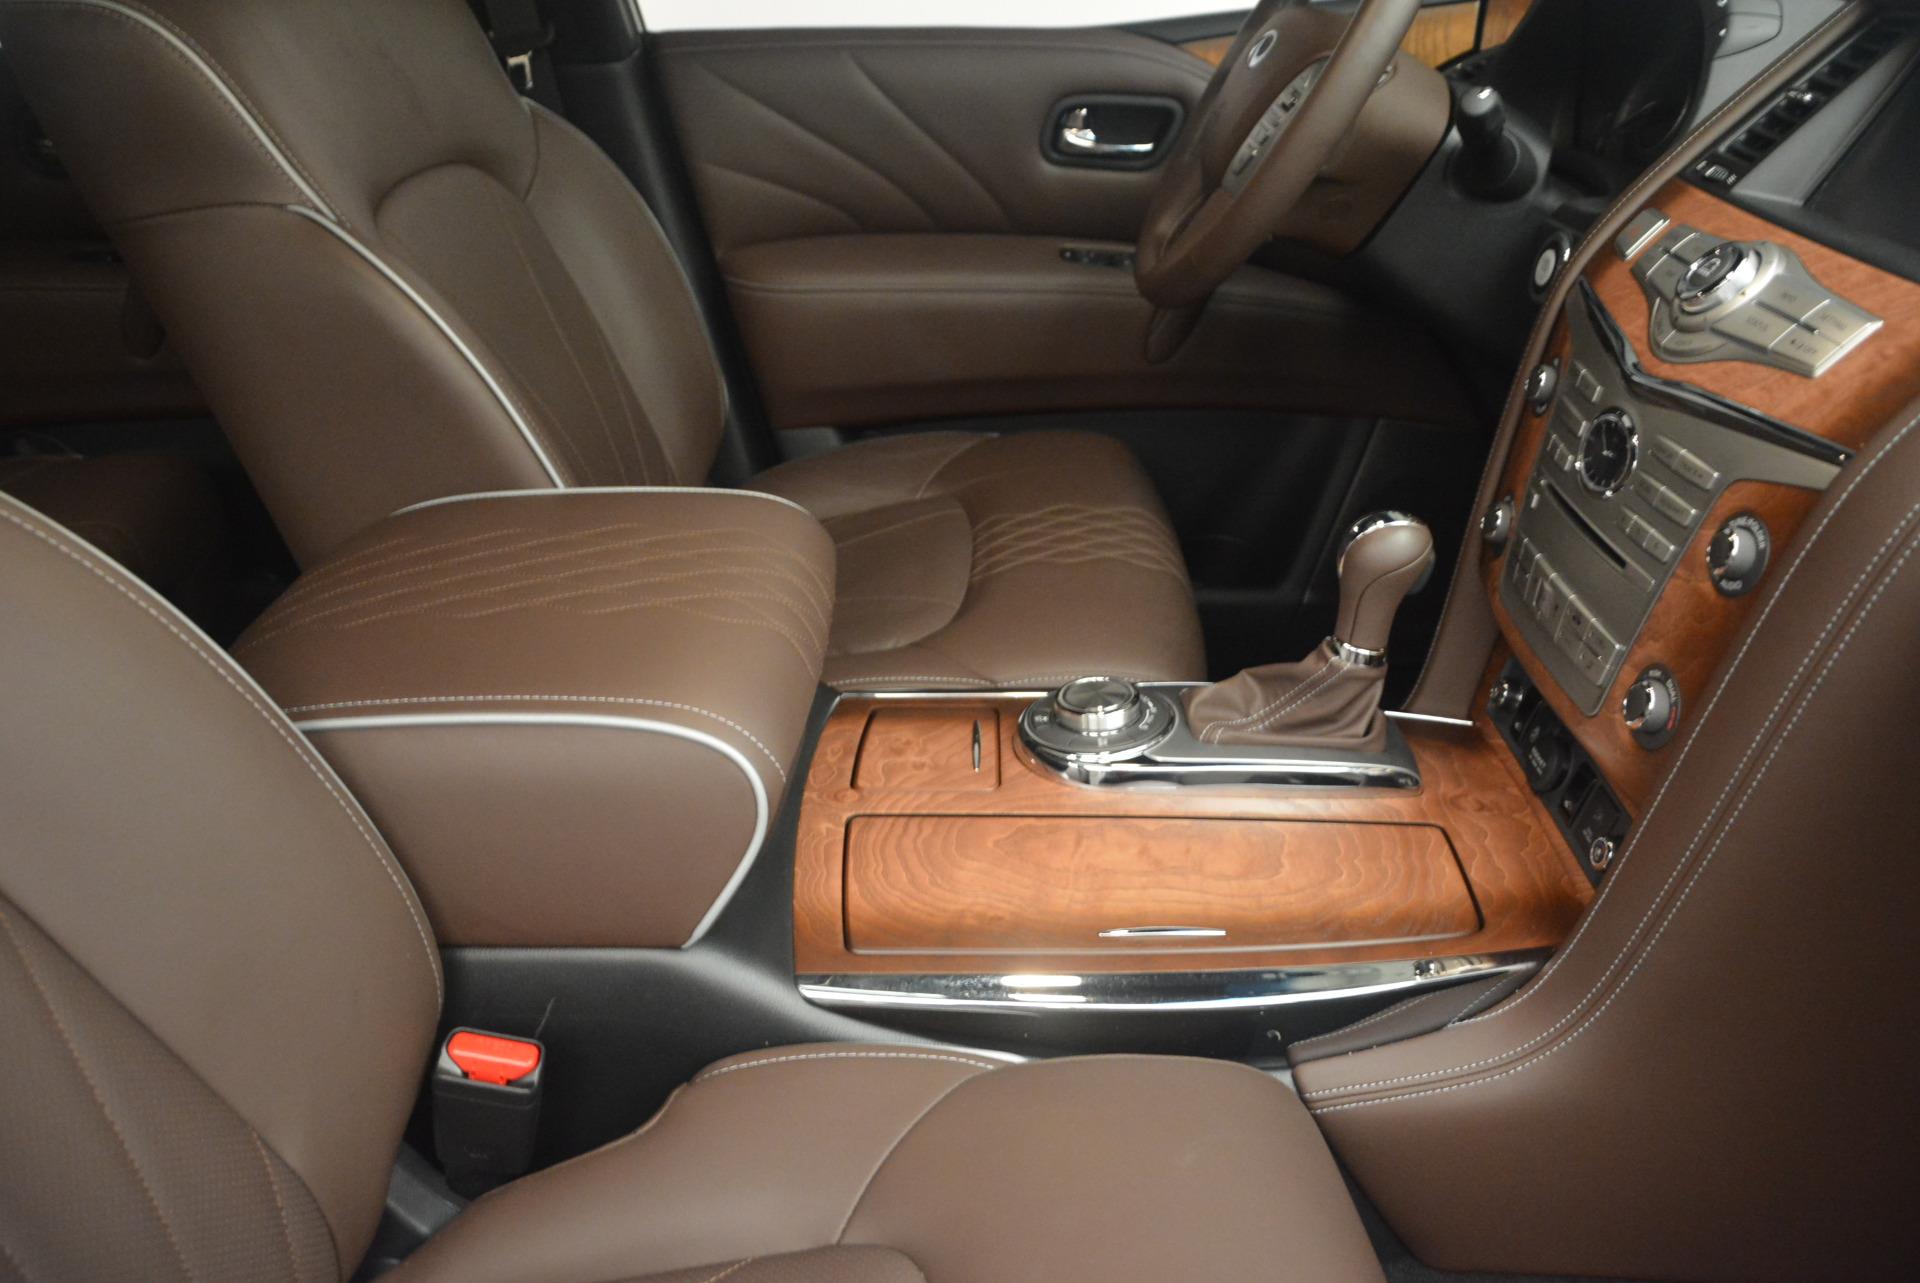 Used 2015 INFINITI QX80 Limited 4WD